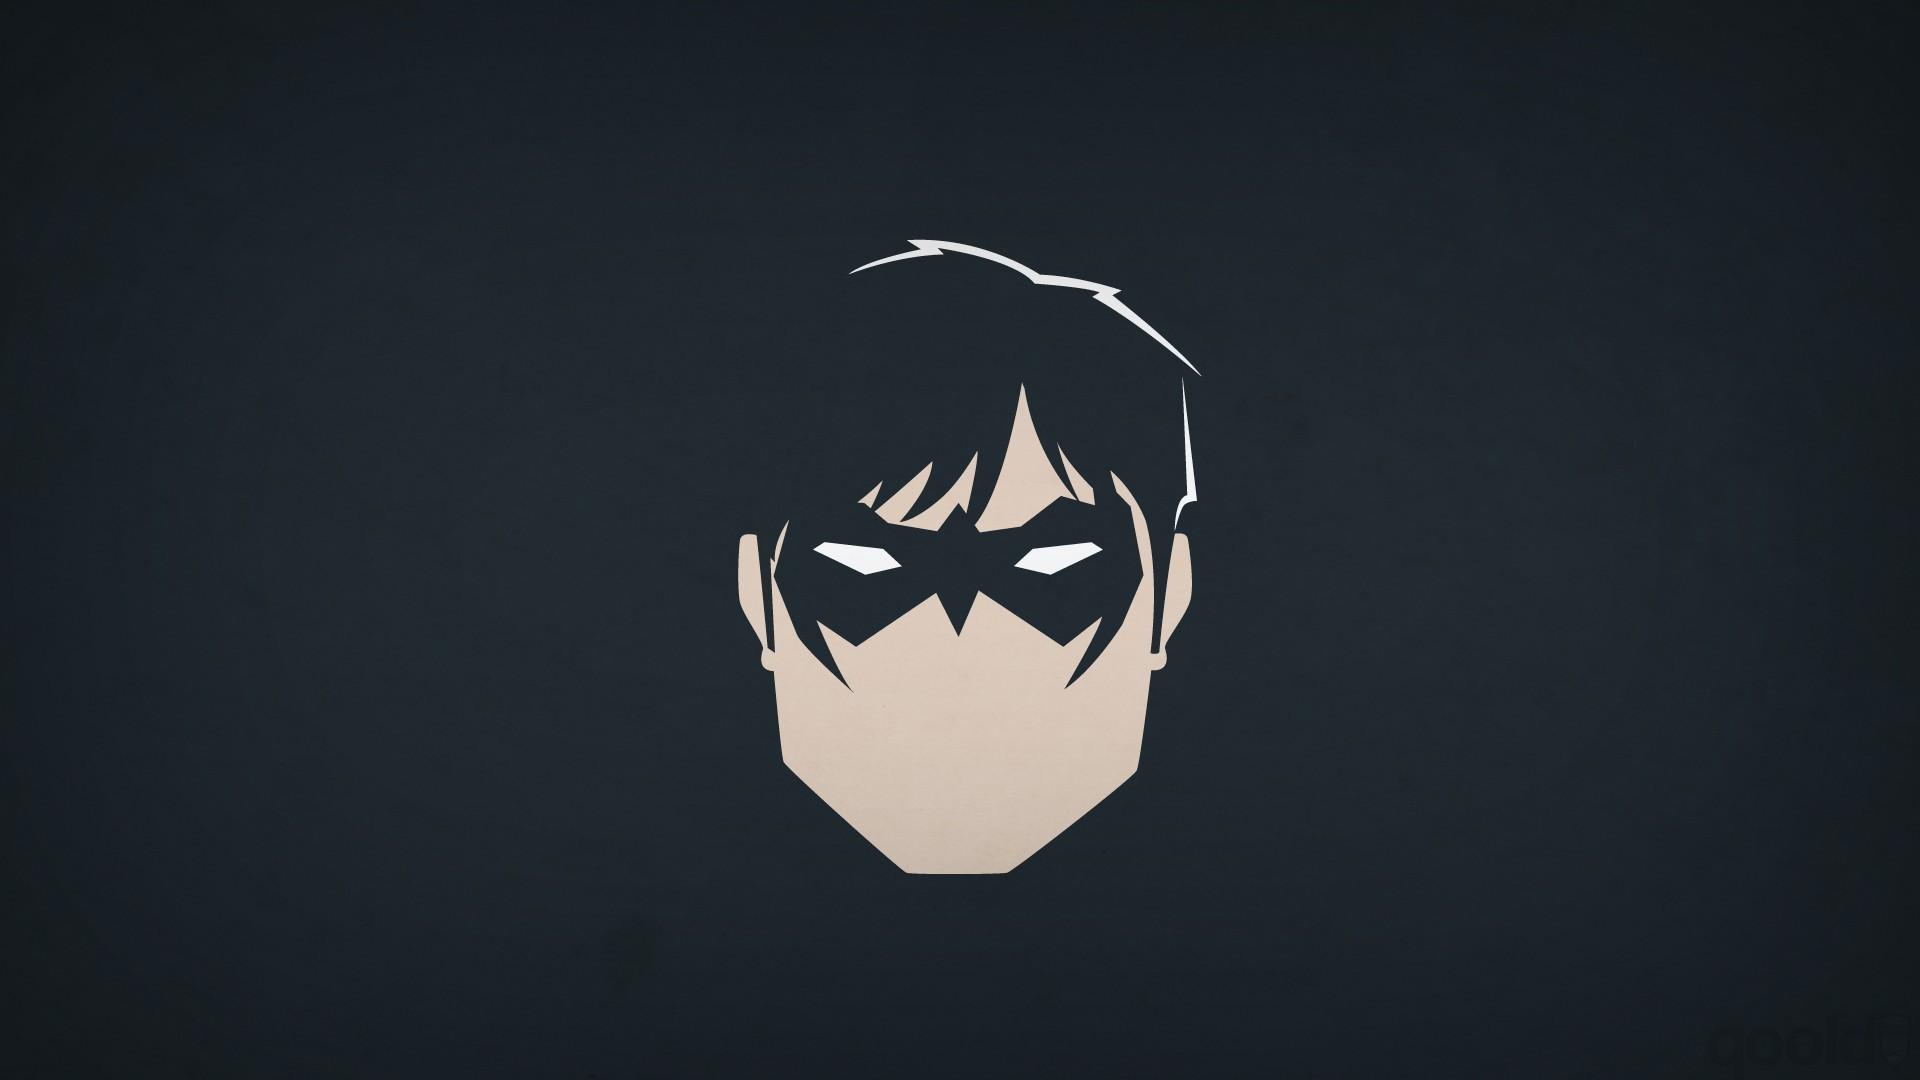 DC Comics, Heroes, Nightwing, Blo0p, Minimalism, Superhero Wallpapers HD /  Desktop and Mobile Backgrounds